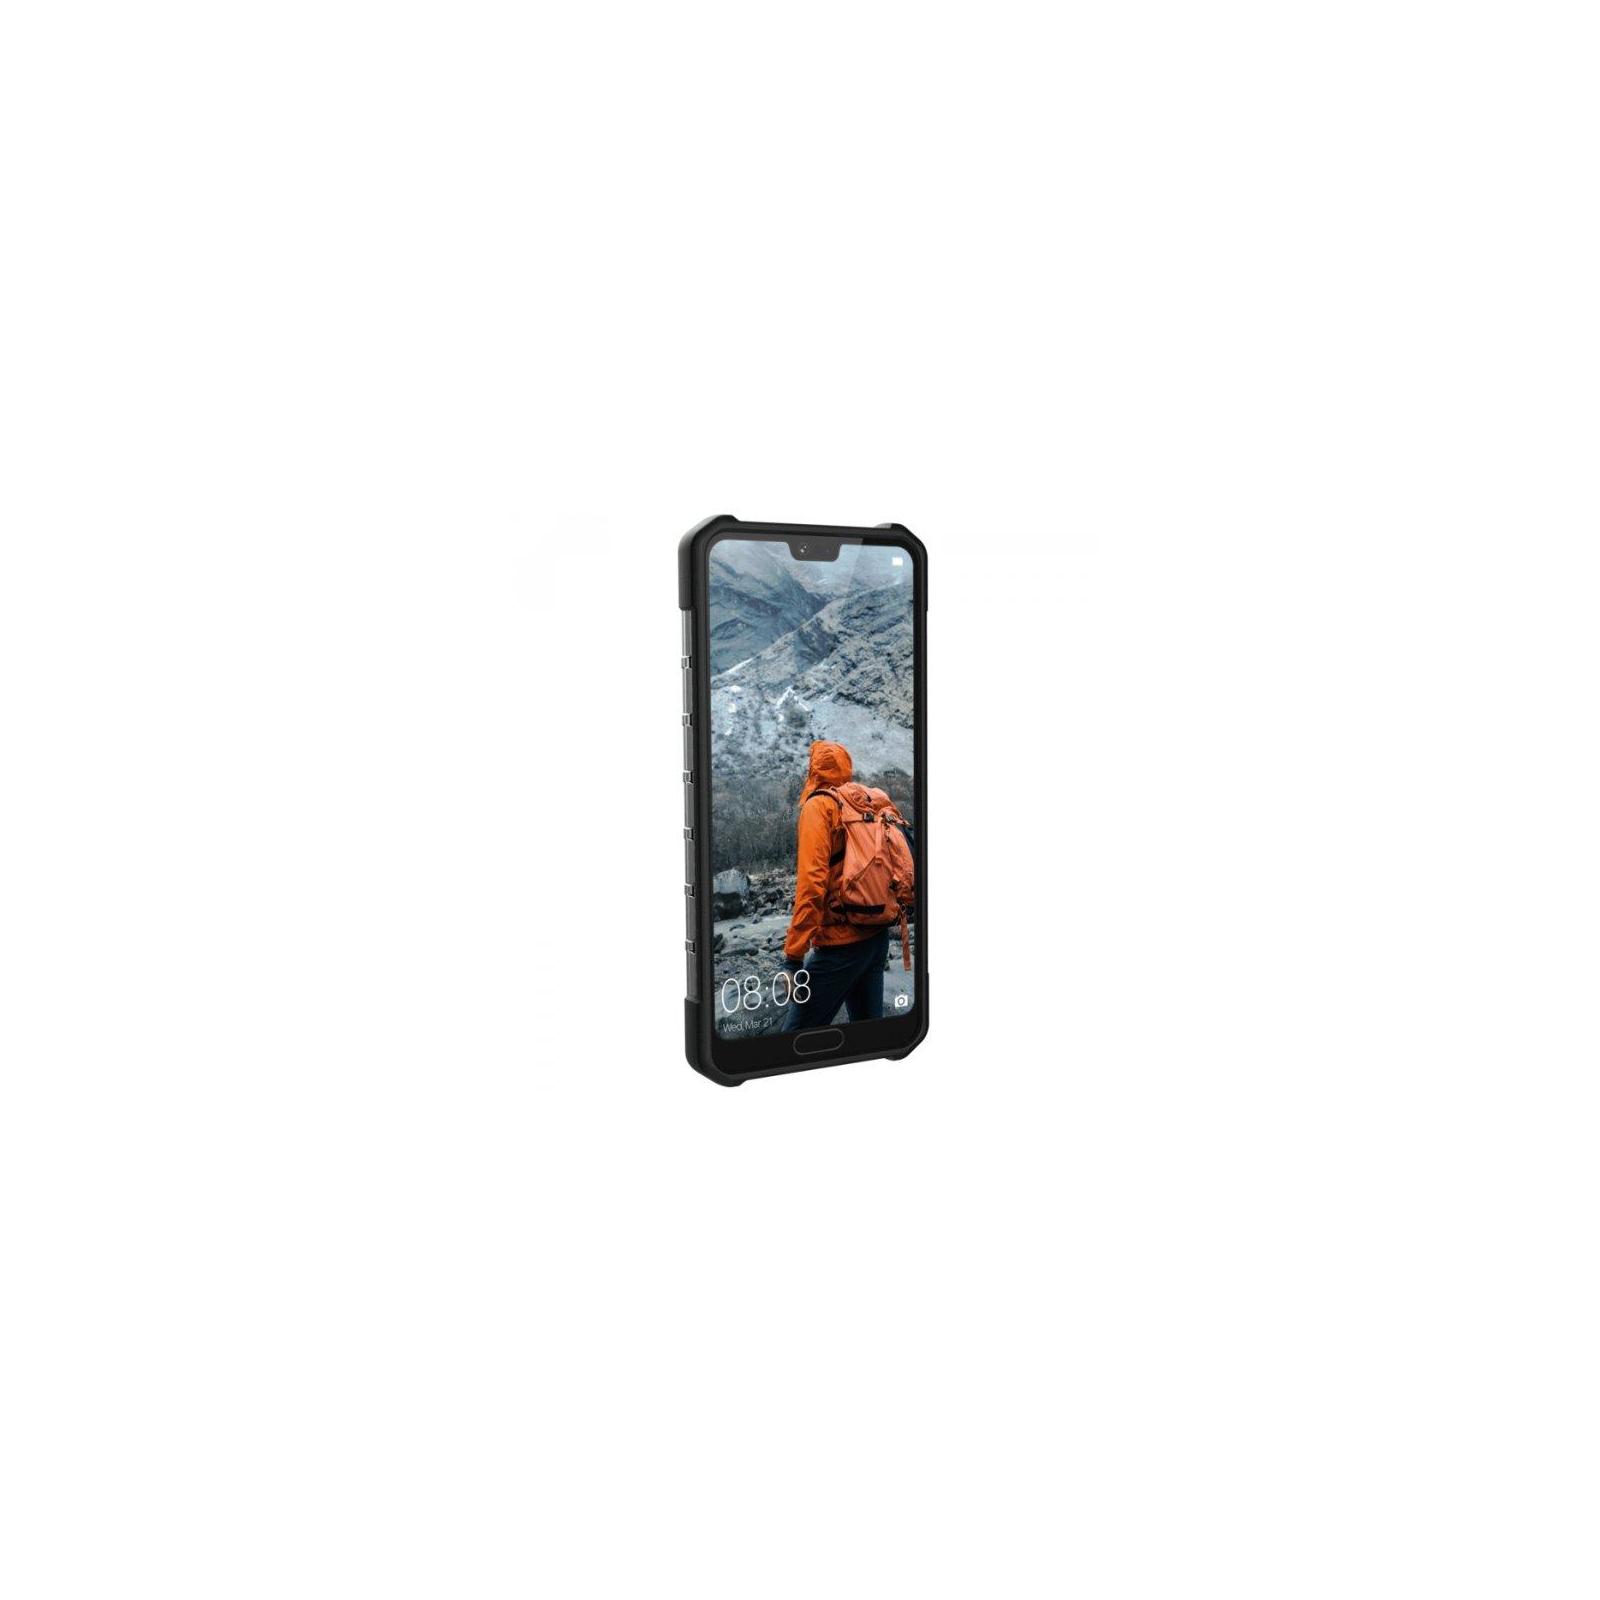 Чехол для моб. телефона Urban Armor Gear Huawei P20 Plasma Ash (HP20-L-AS) изображение 4